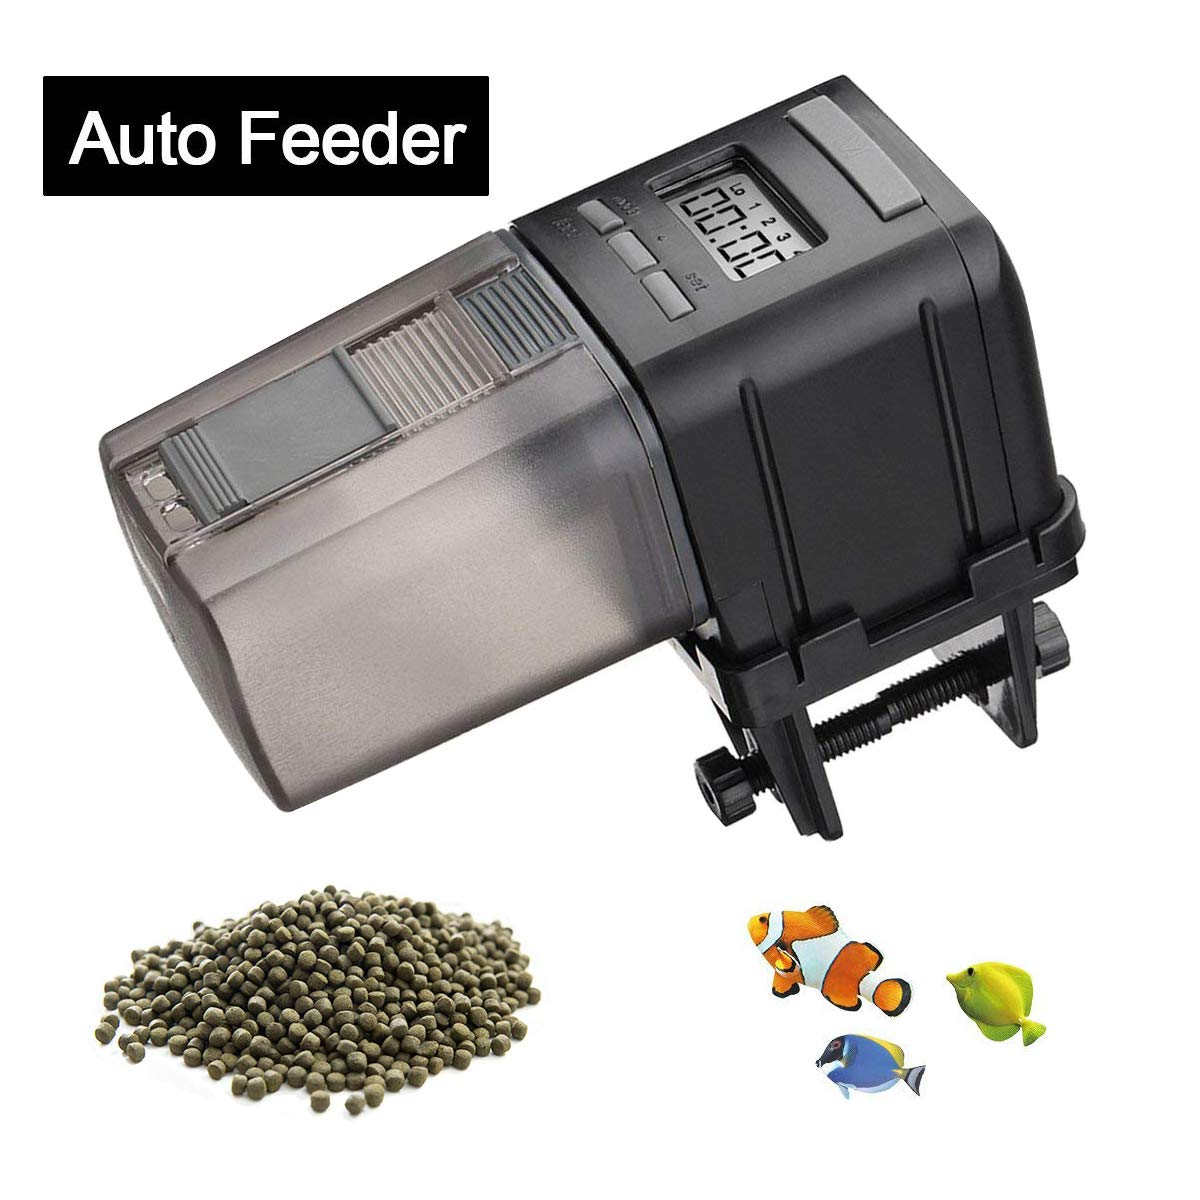 JoyMall Automatic Fish Food Feeder,Auto